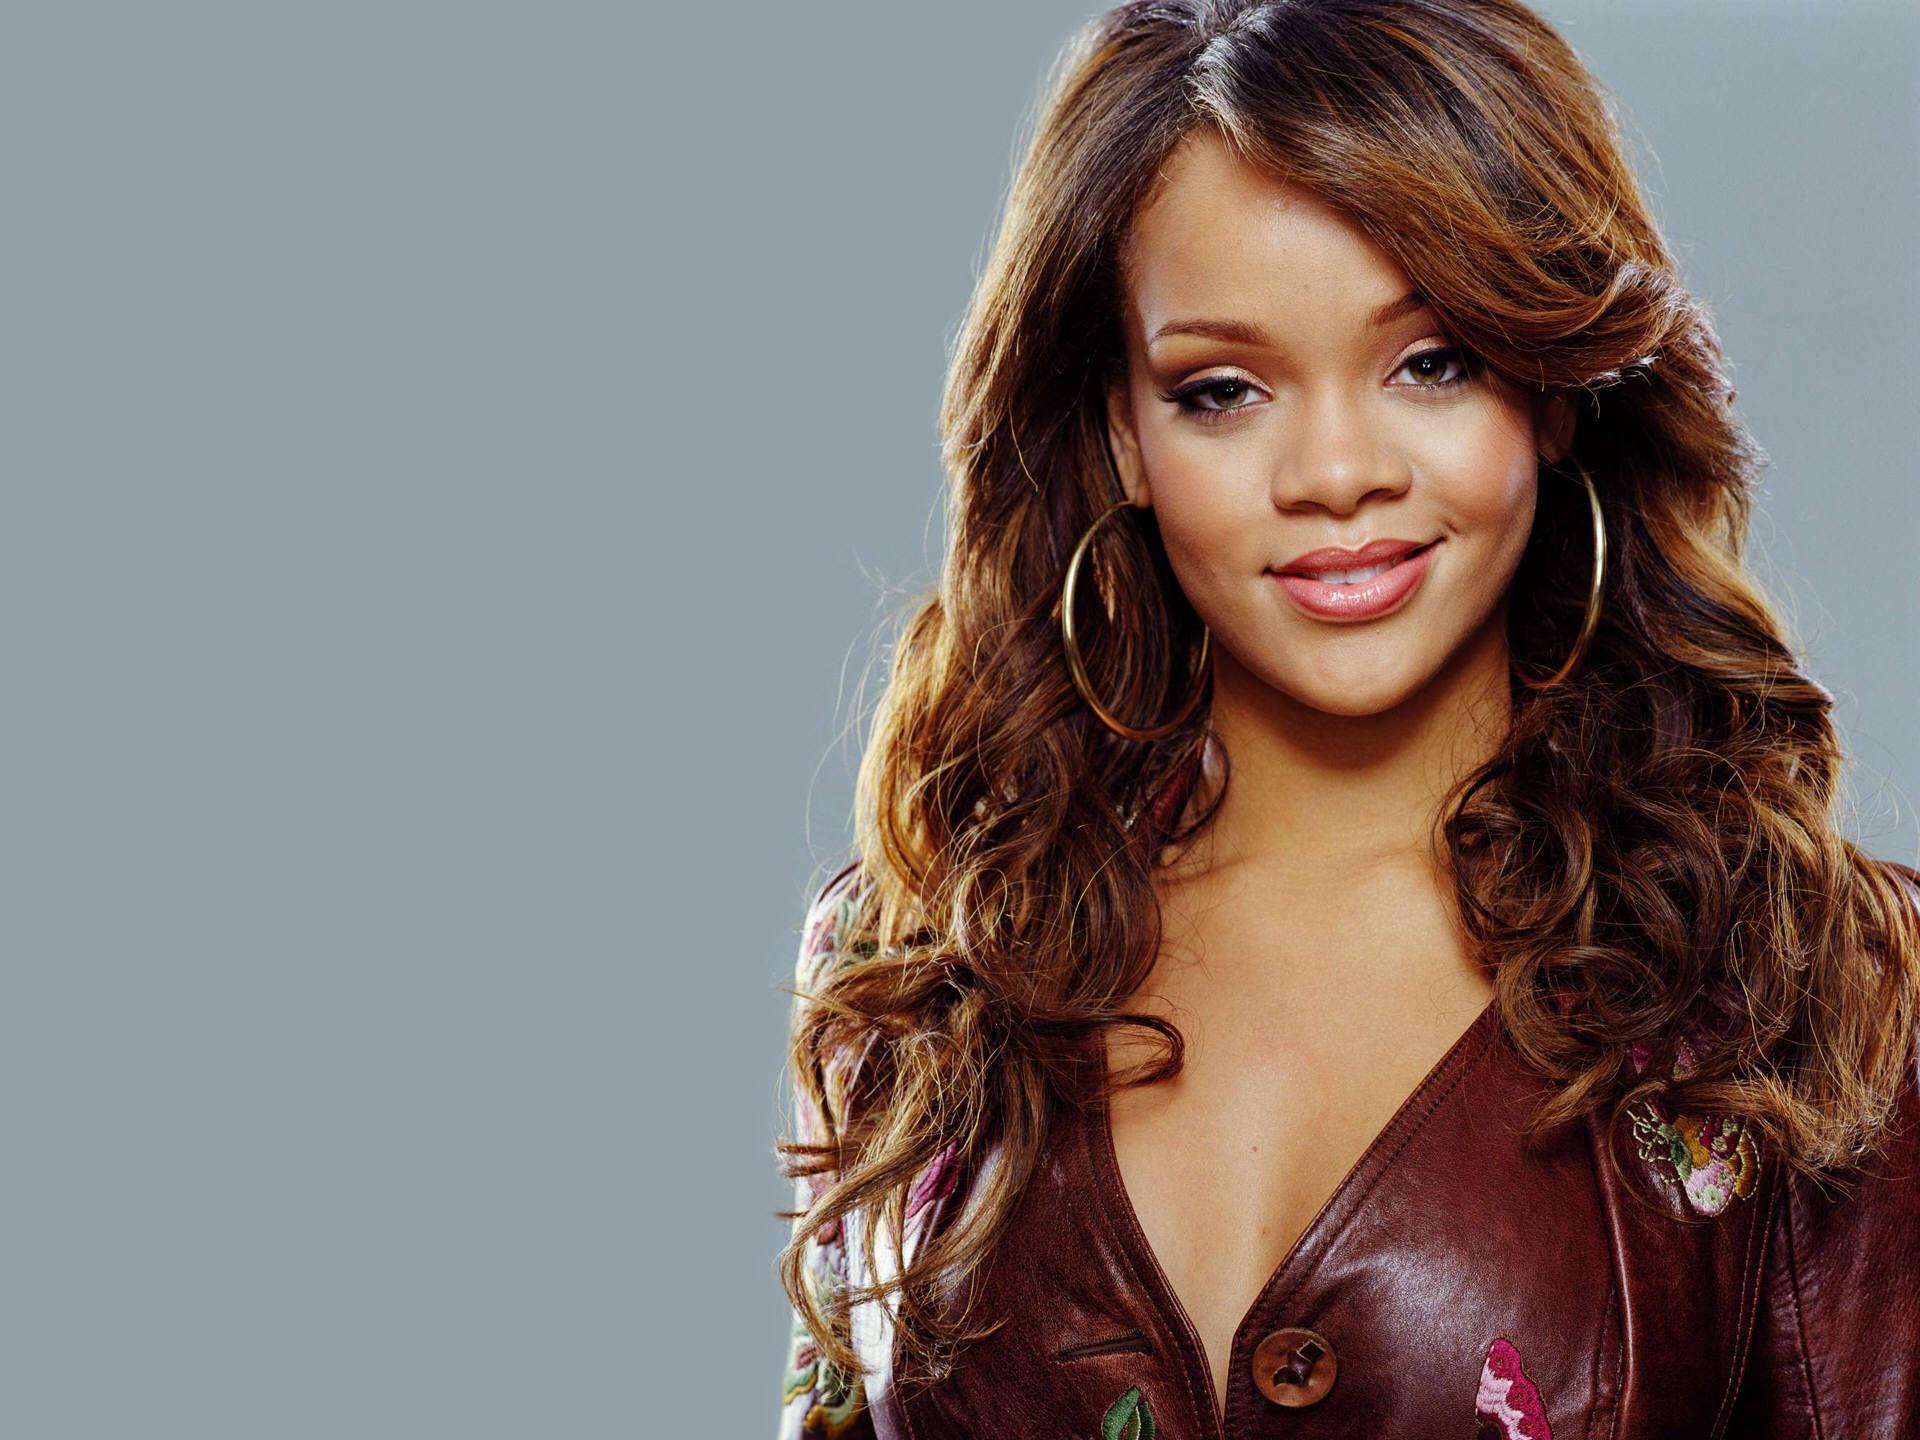 Rihanna Images